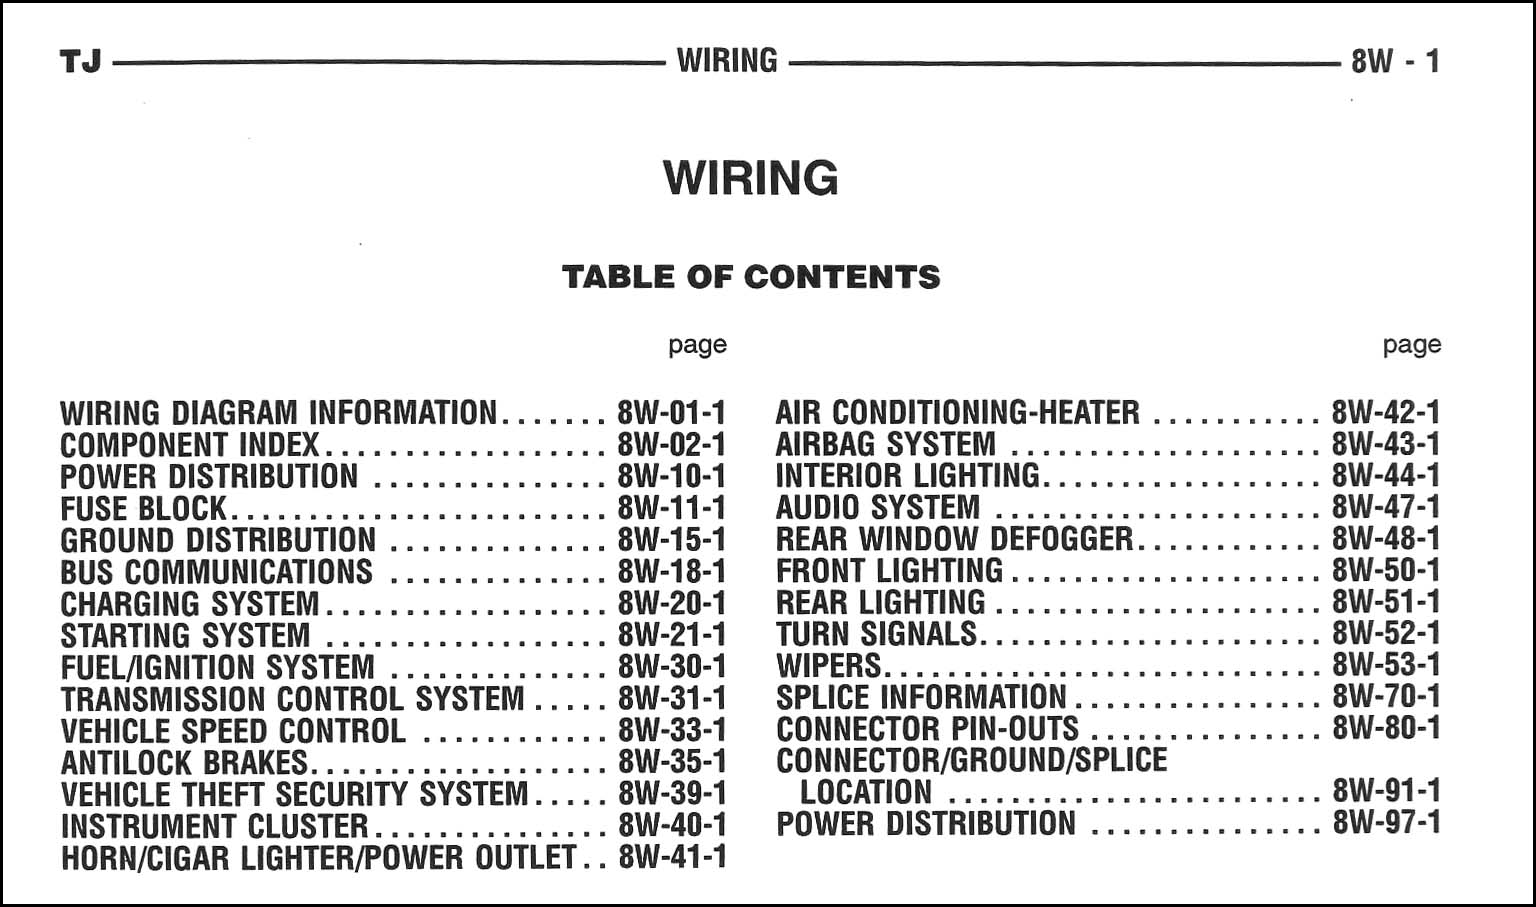 2005JeepWranglerOWD TOC?resize=665%2C393 wiring diagram for 2005 jeep wrangler readingrat net 2005 jeep wrangler stereo wiring diagram at eliteediting.co